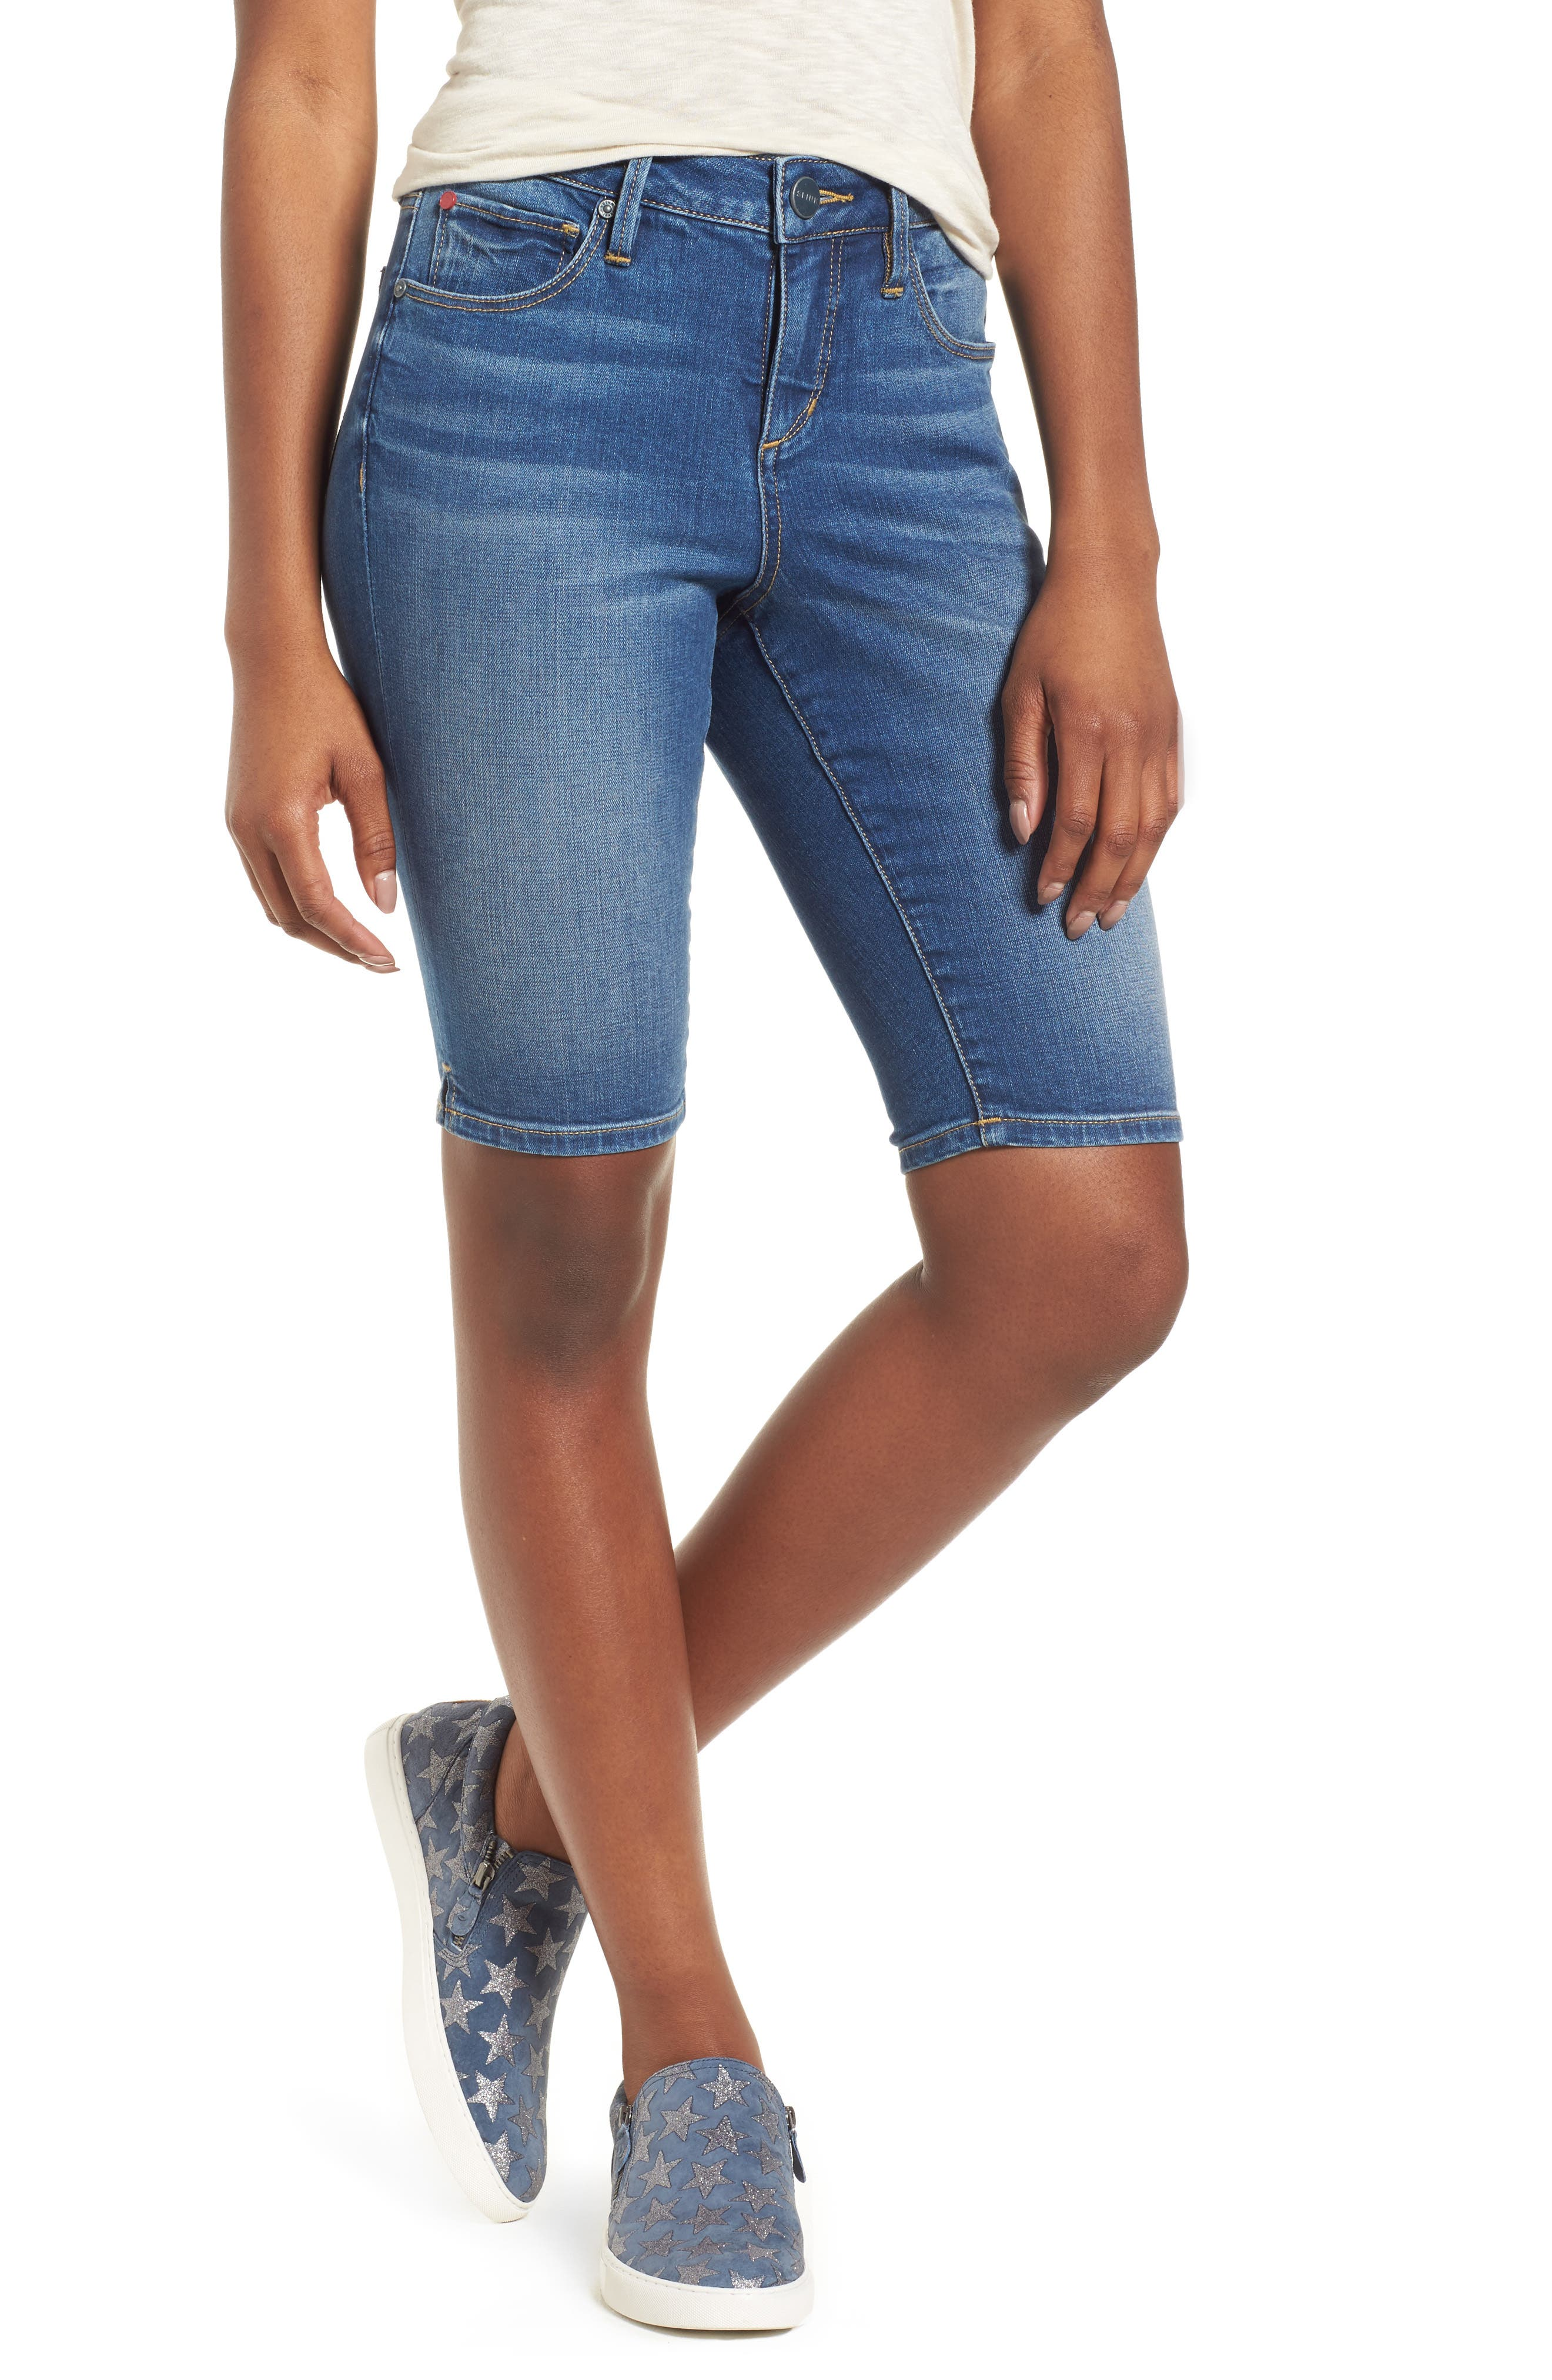 SLINK Jeans Bermuda Shorts (Birdy)